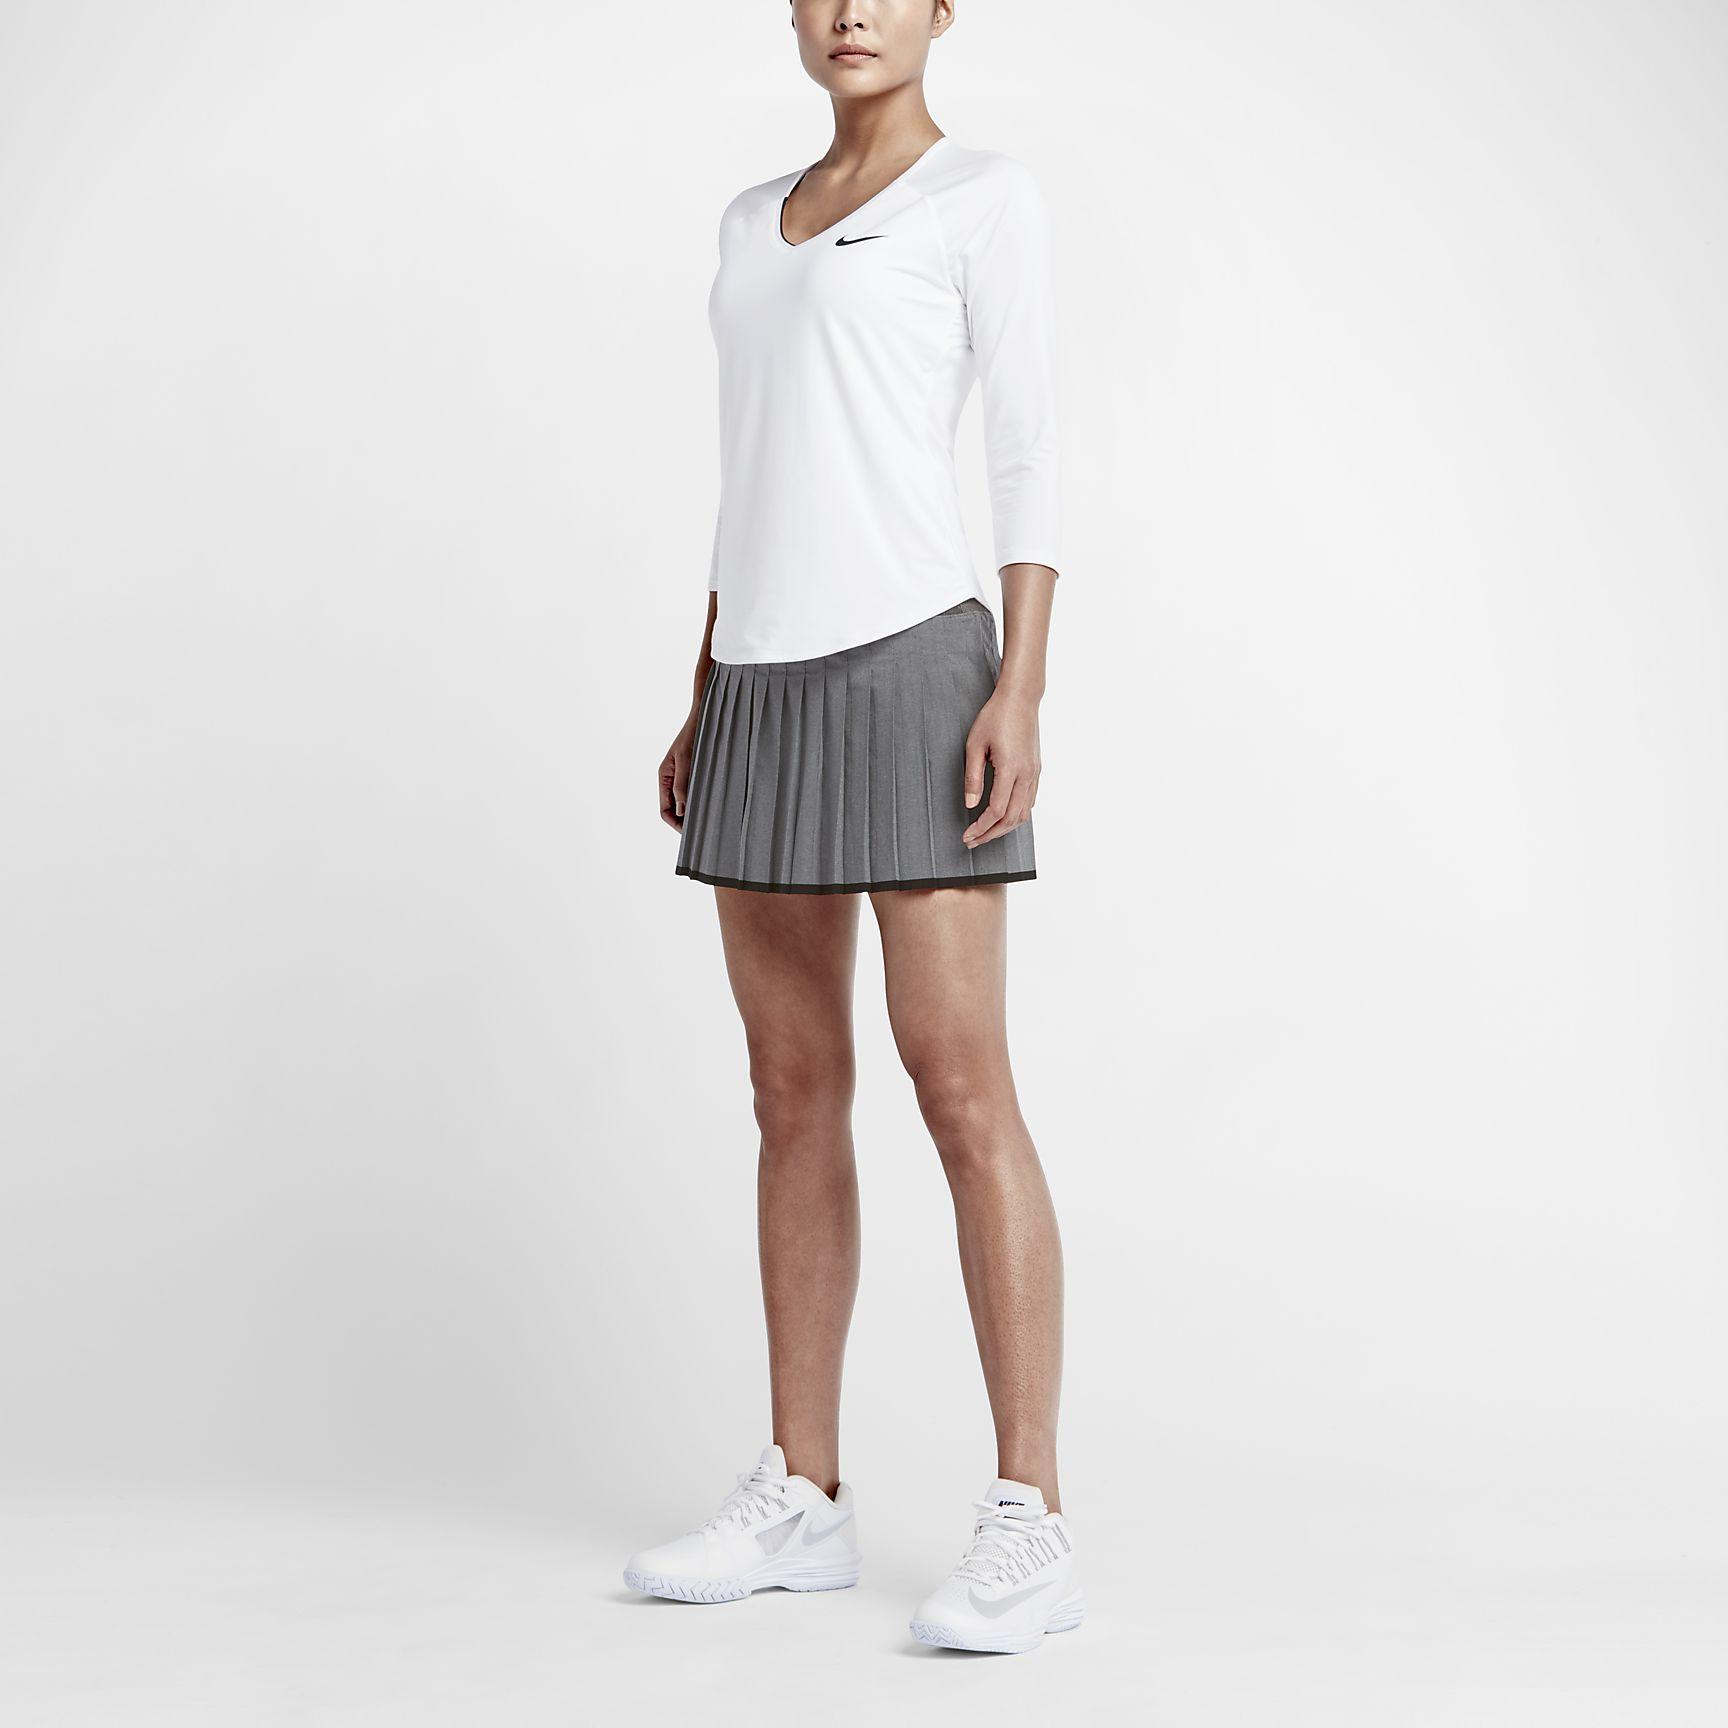 Nikecourt Pure Women S Tennis Top Womens Tennis Tops Tennis Tops Womens Tennis Skirts